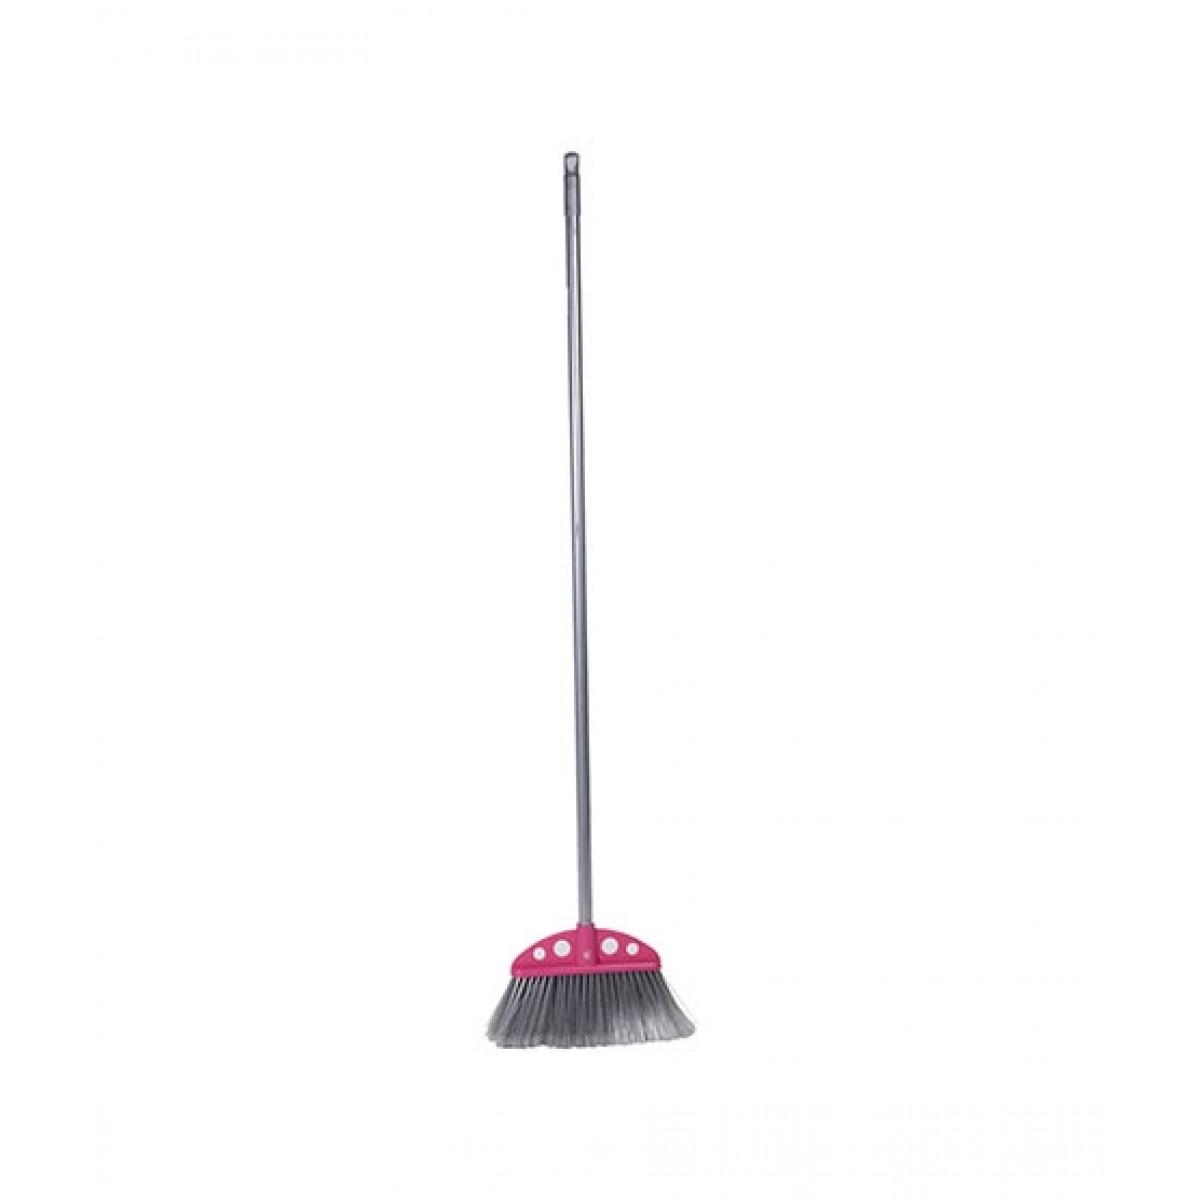 WBM Home Carpet Cleaning Broom Brush